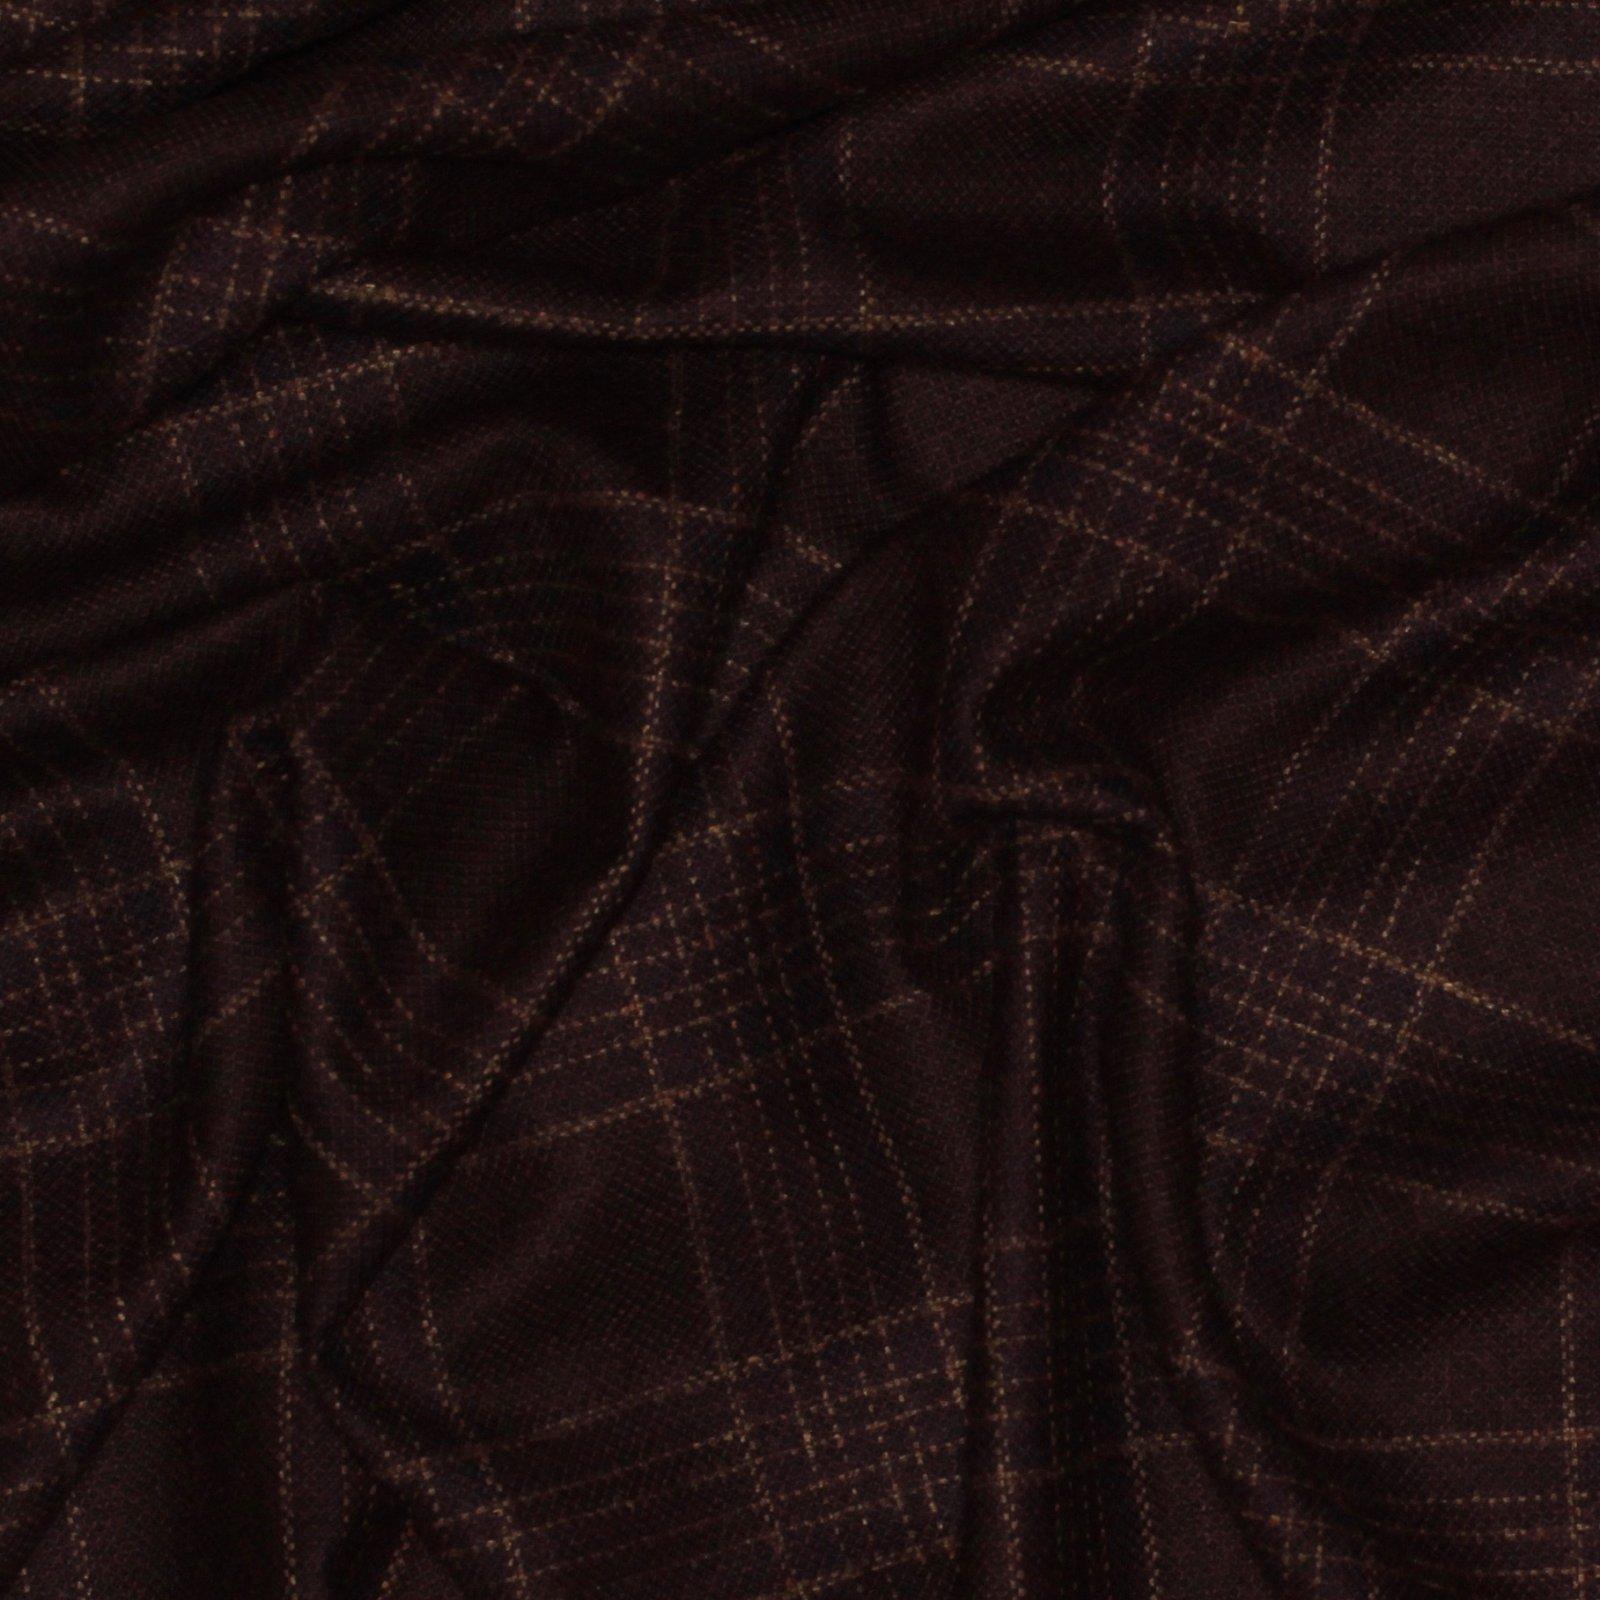 Burgundy/Plum Box Plaid Italian Wool/Silk Blend; 60